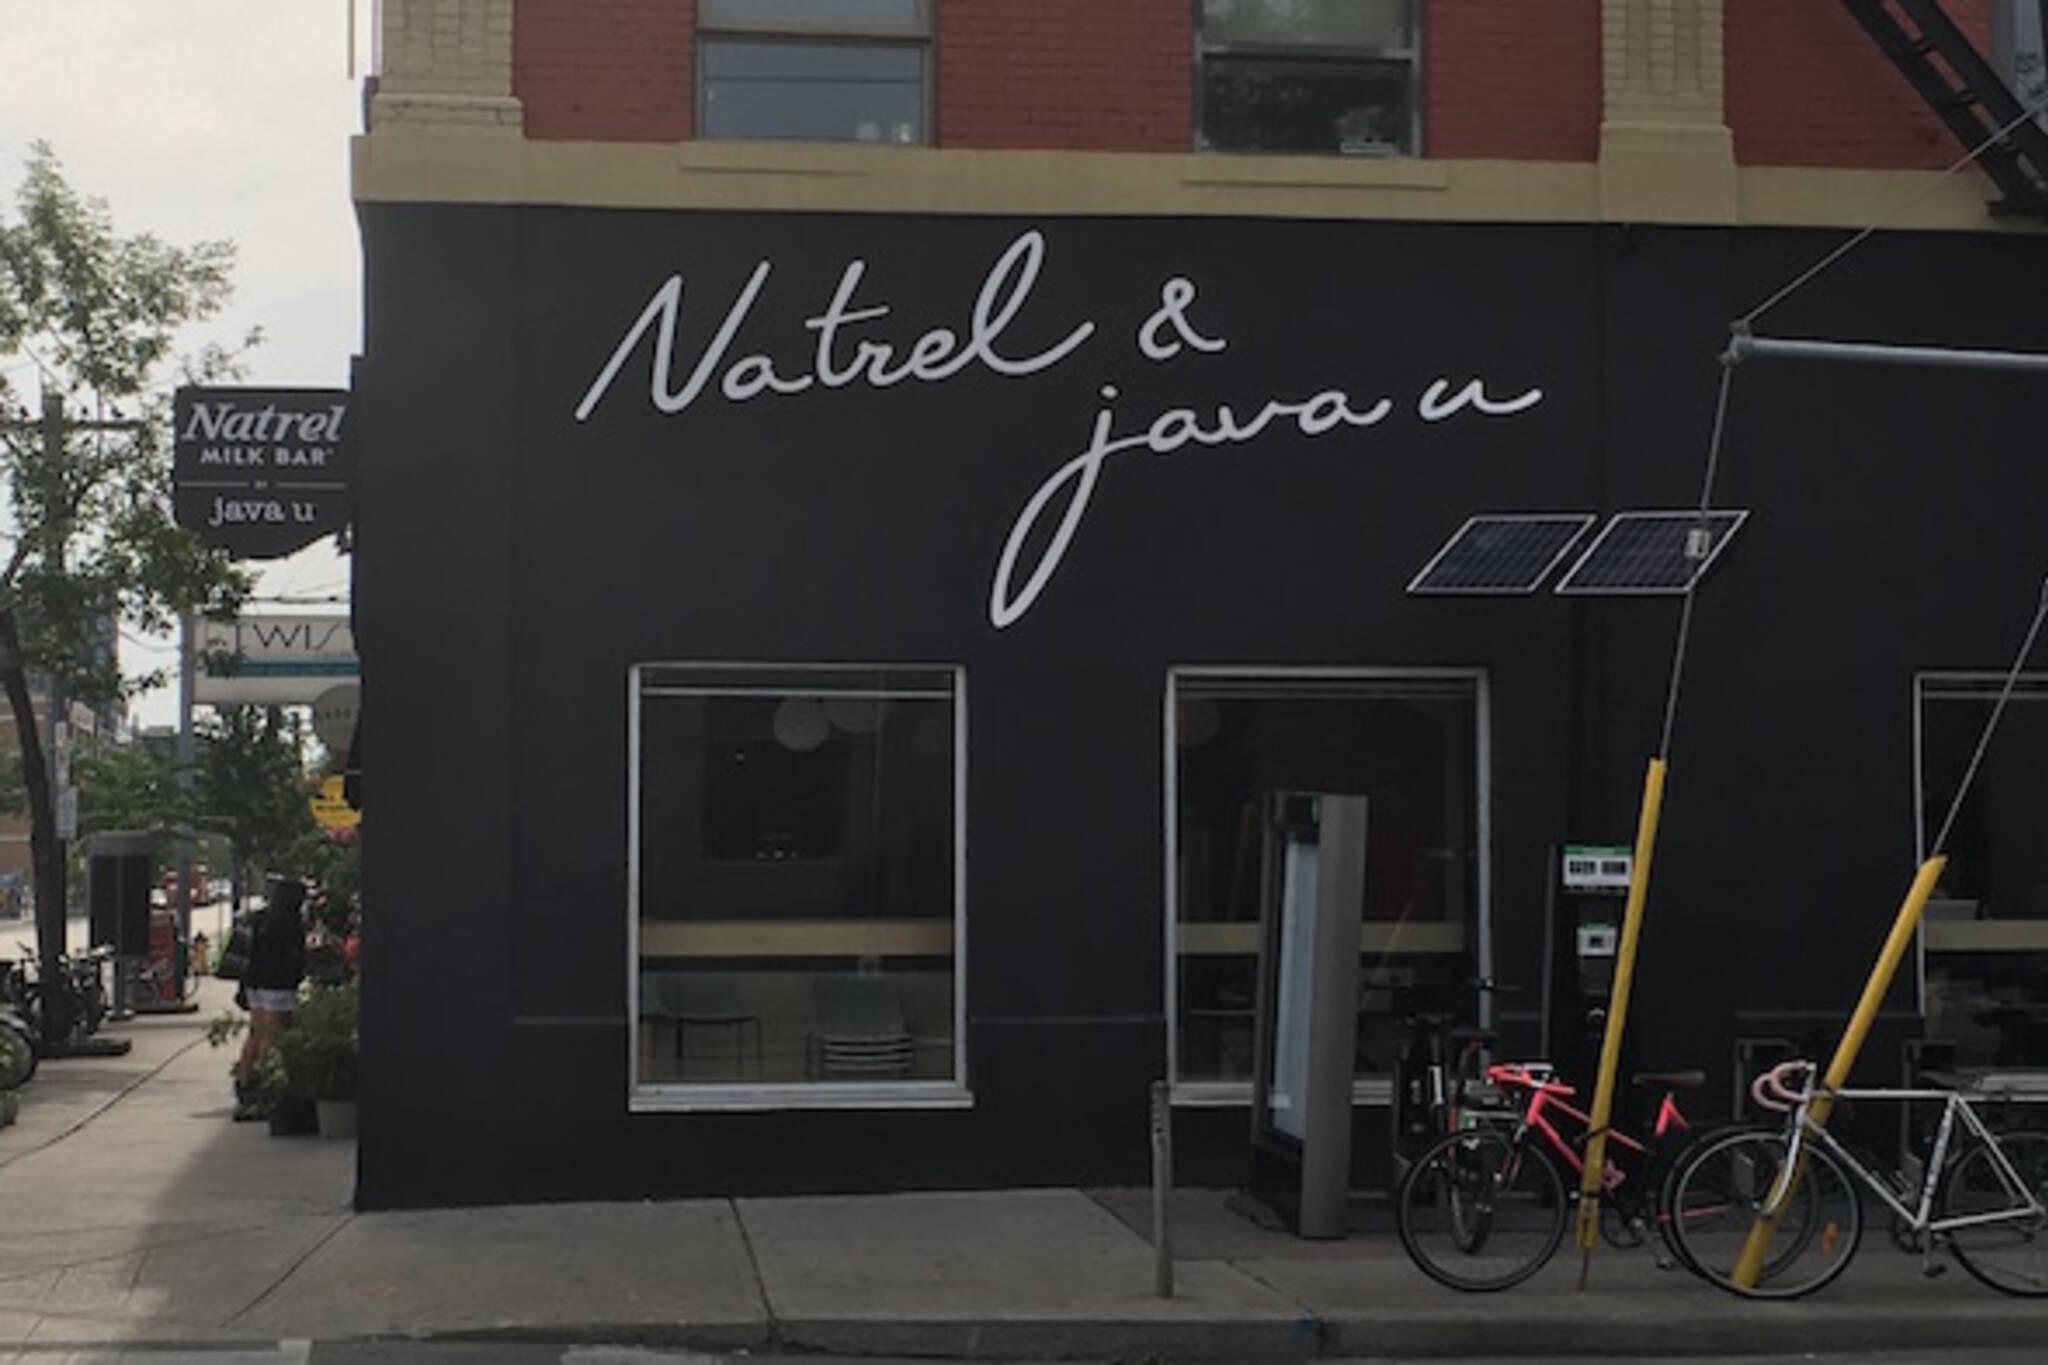 Natrel Milk Bar Toronto